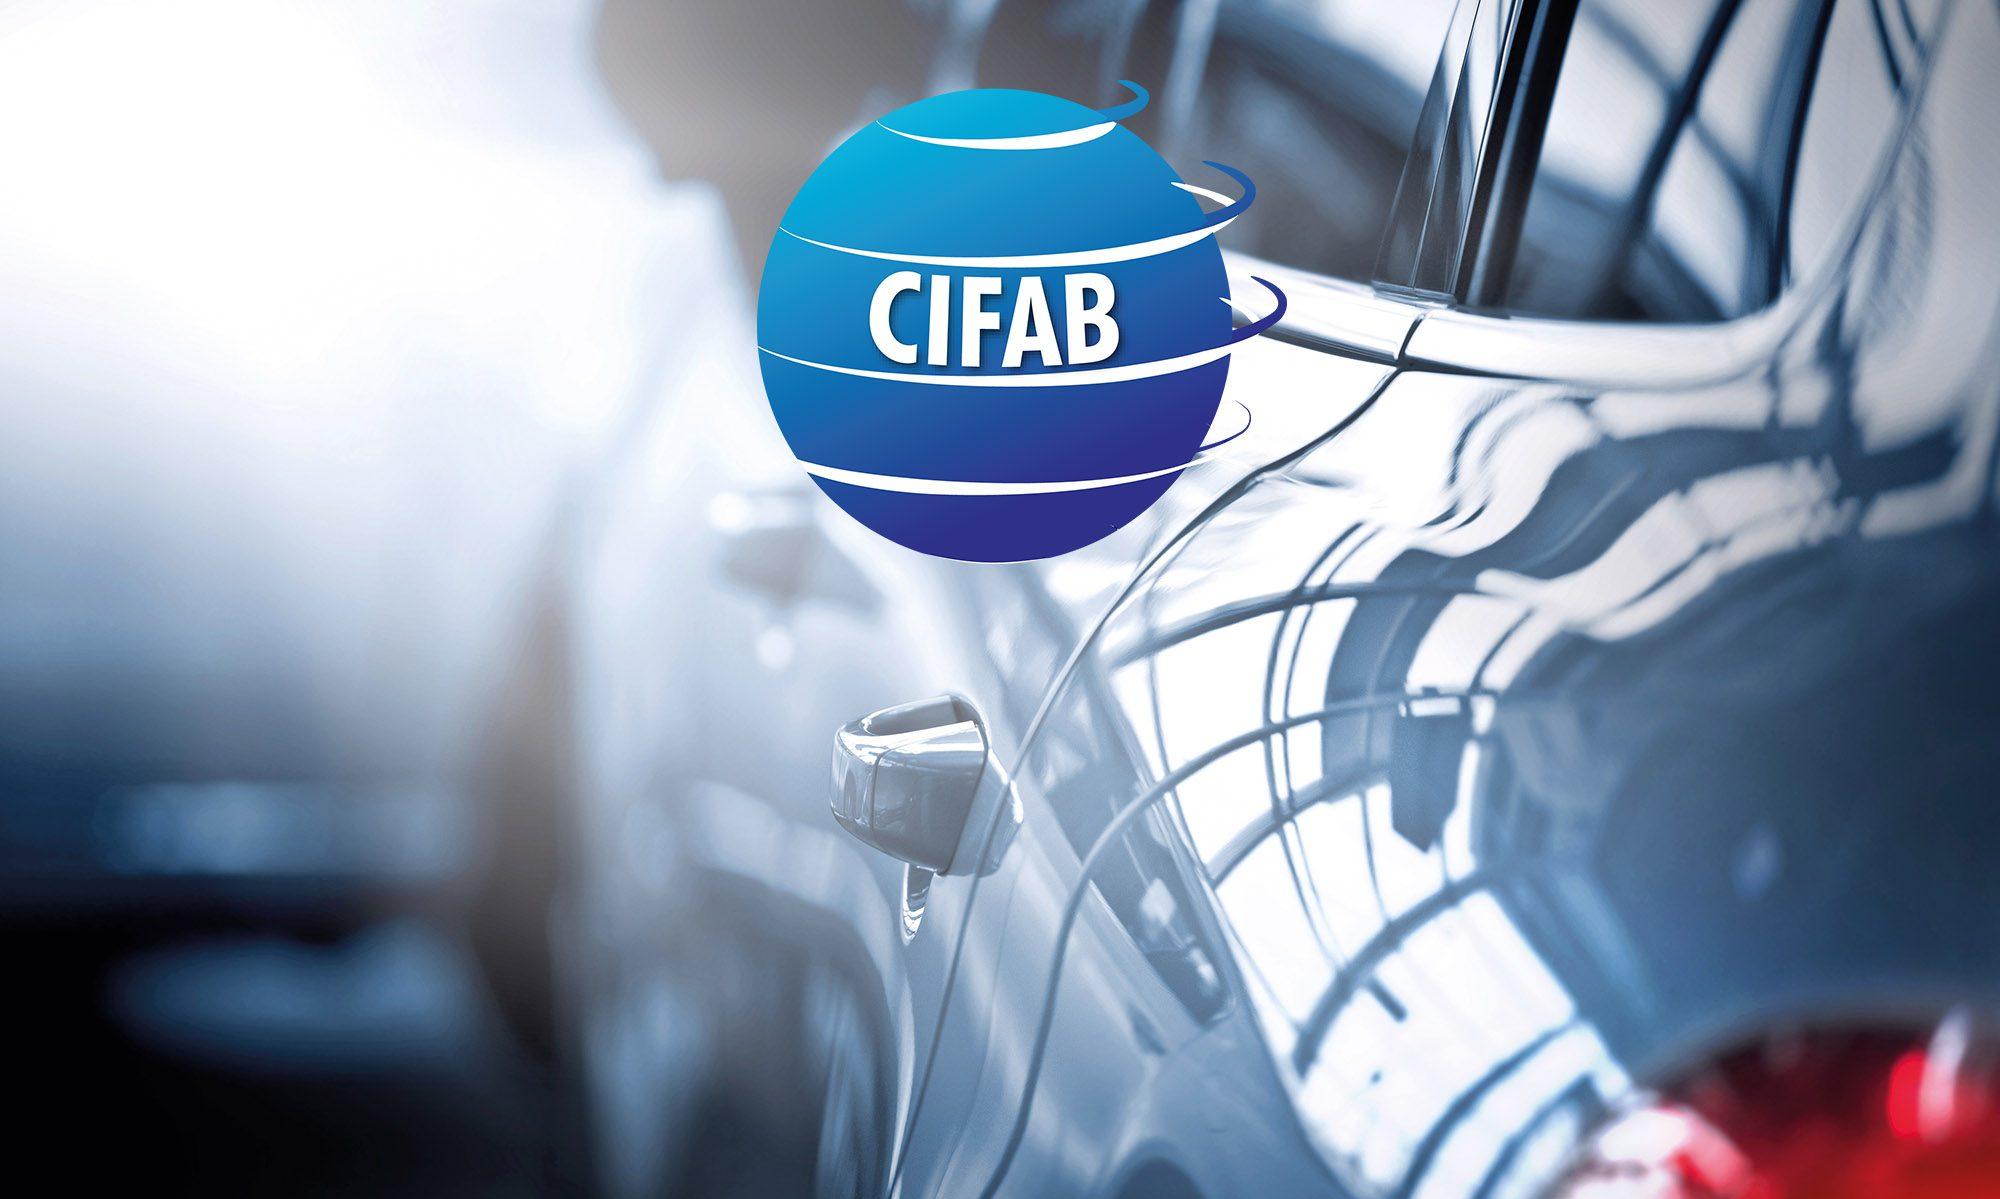 CIFAB Trading